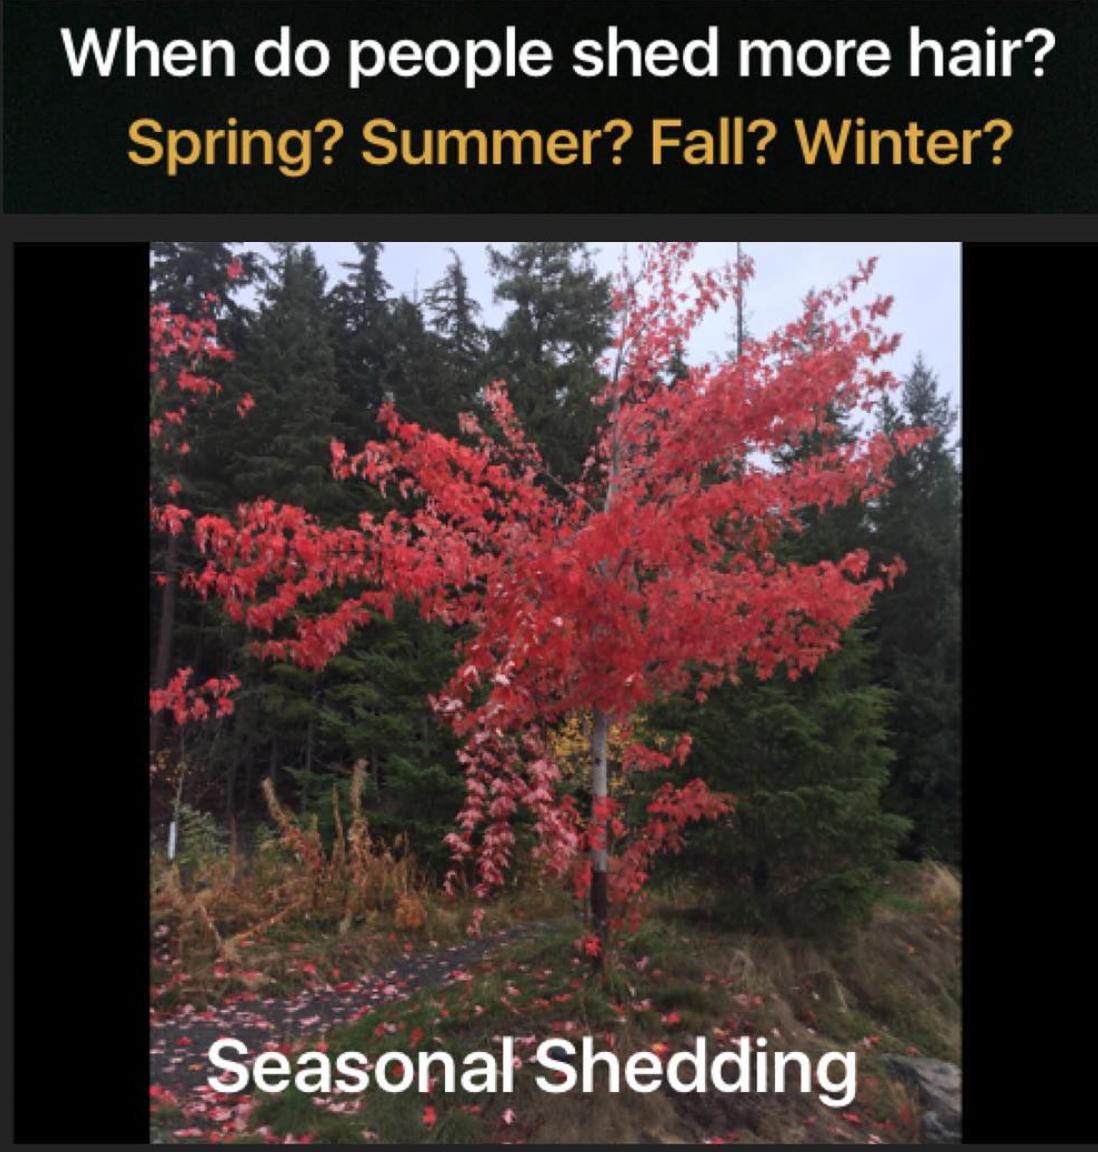 Seasonalshedding